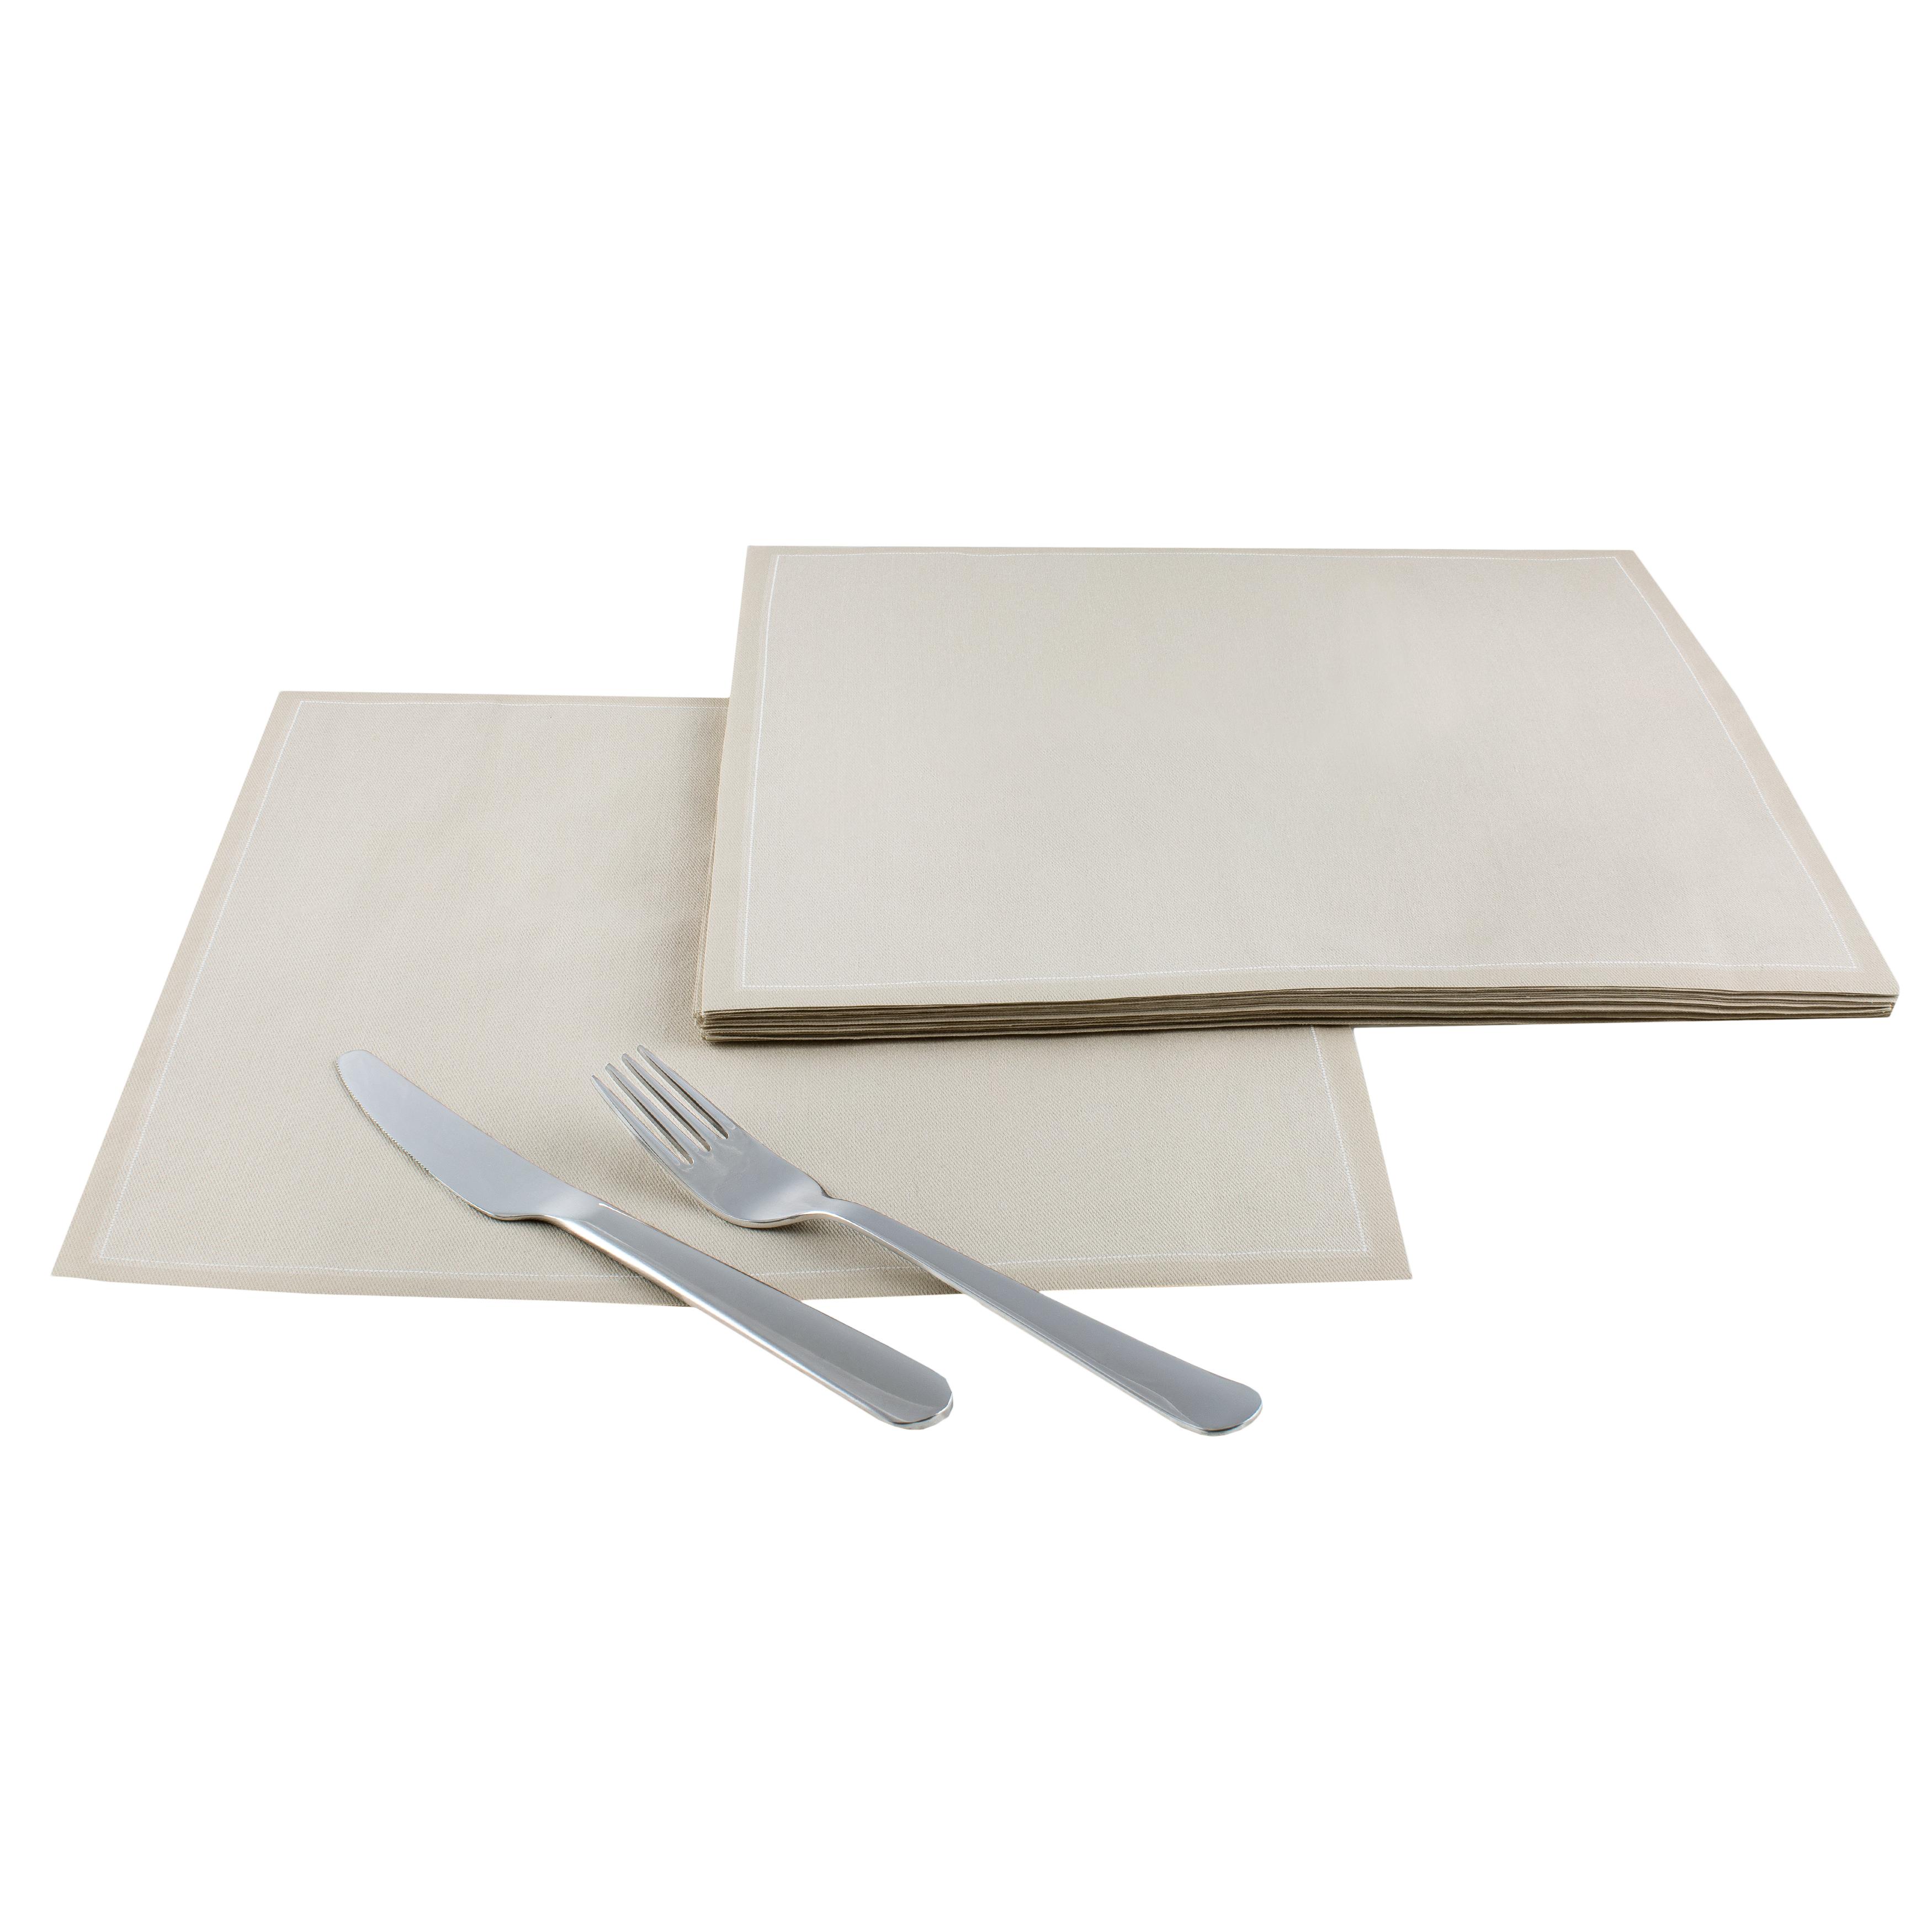 "Sand Cotton Dinner Napkins - 12.6"" x 12.6"" - 25 Units"